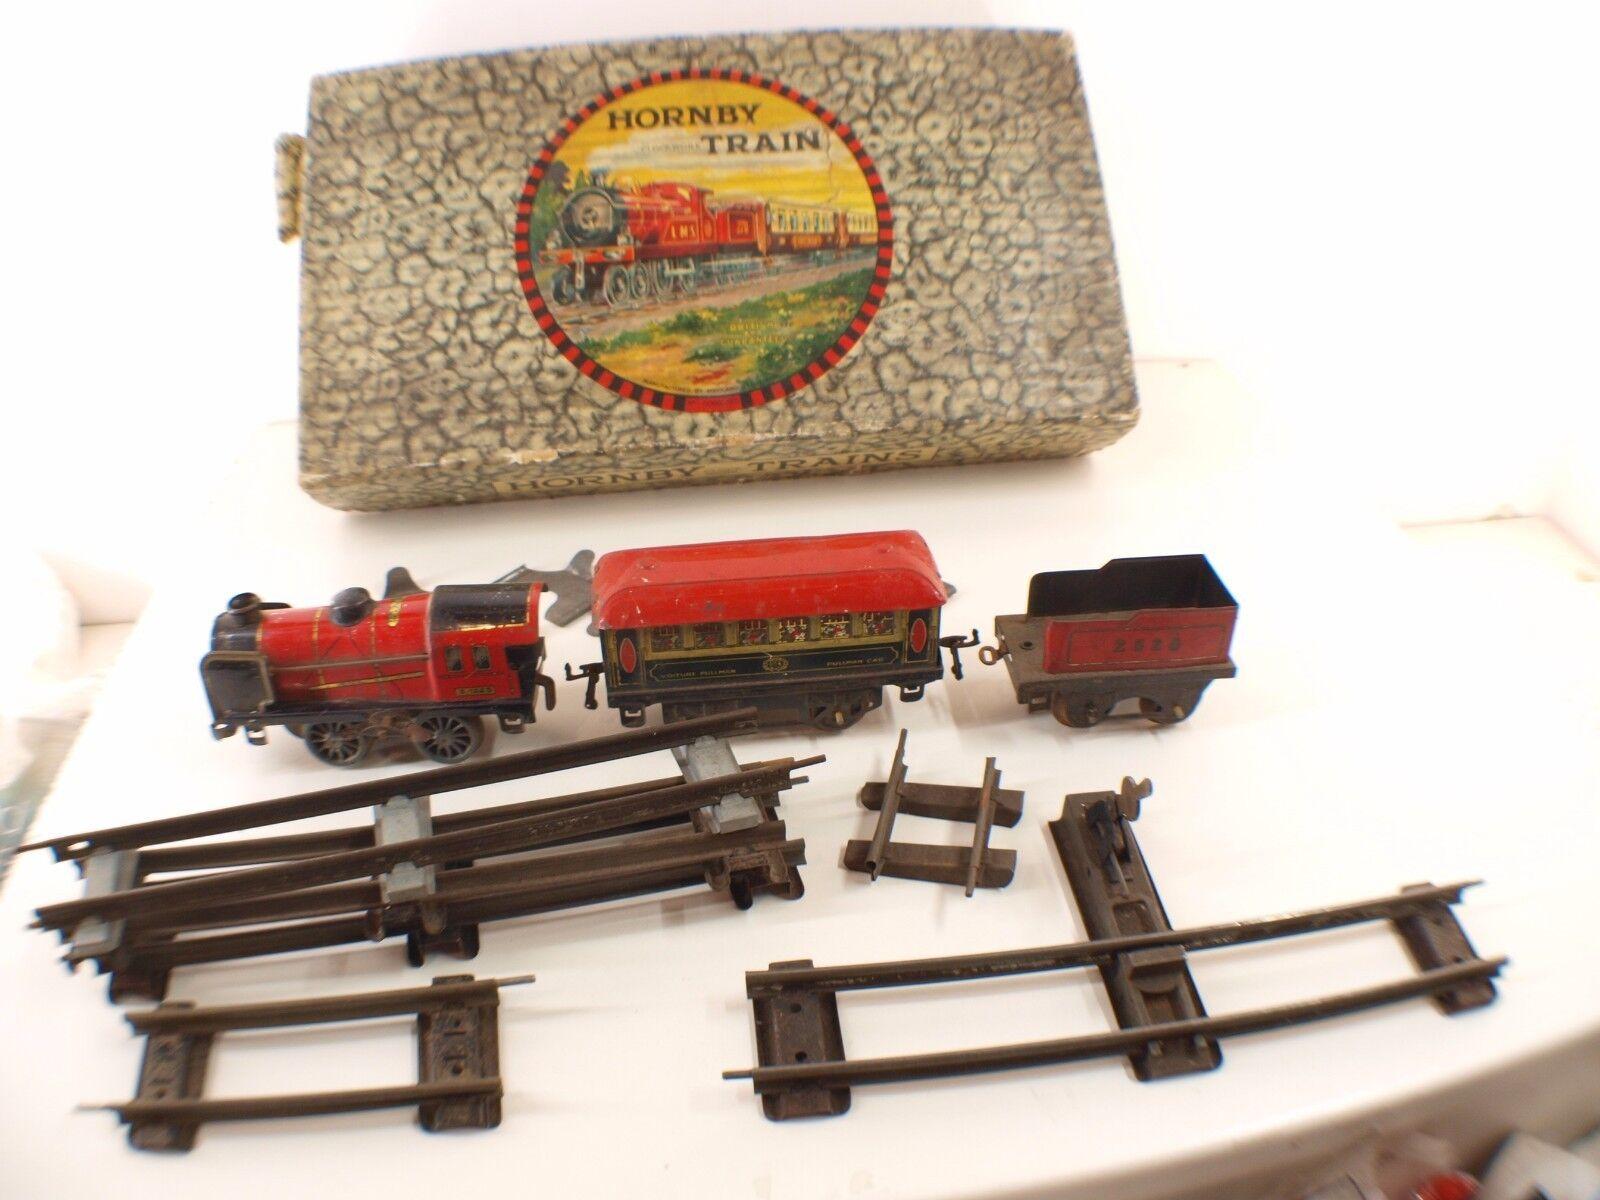 Hornby Caja N º 1 Goodset Tren Clockwork Loco 3.1225 Pullman Raíl 35 MM